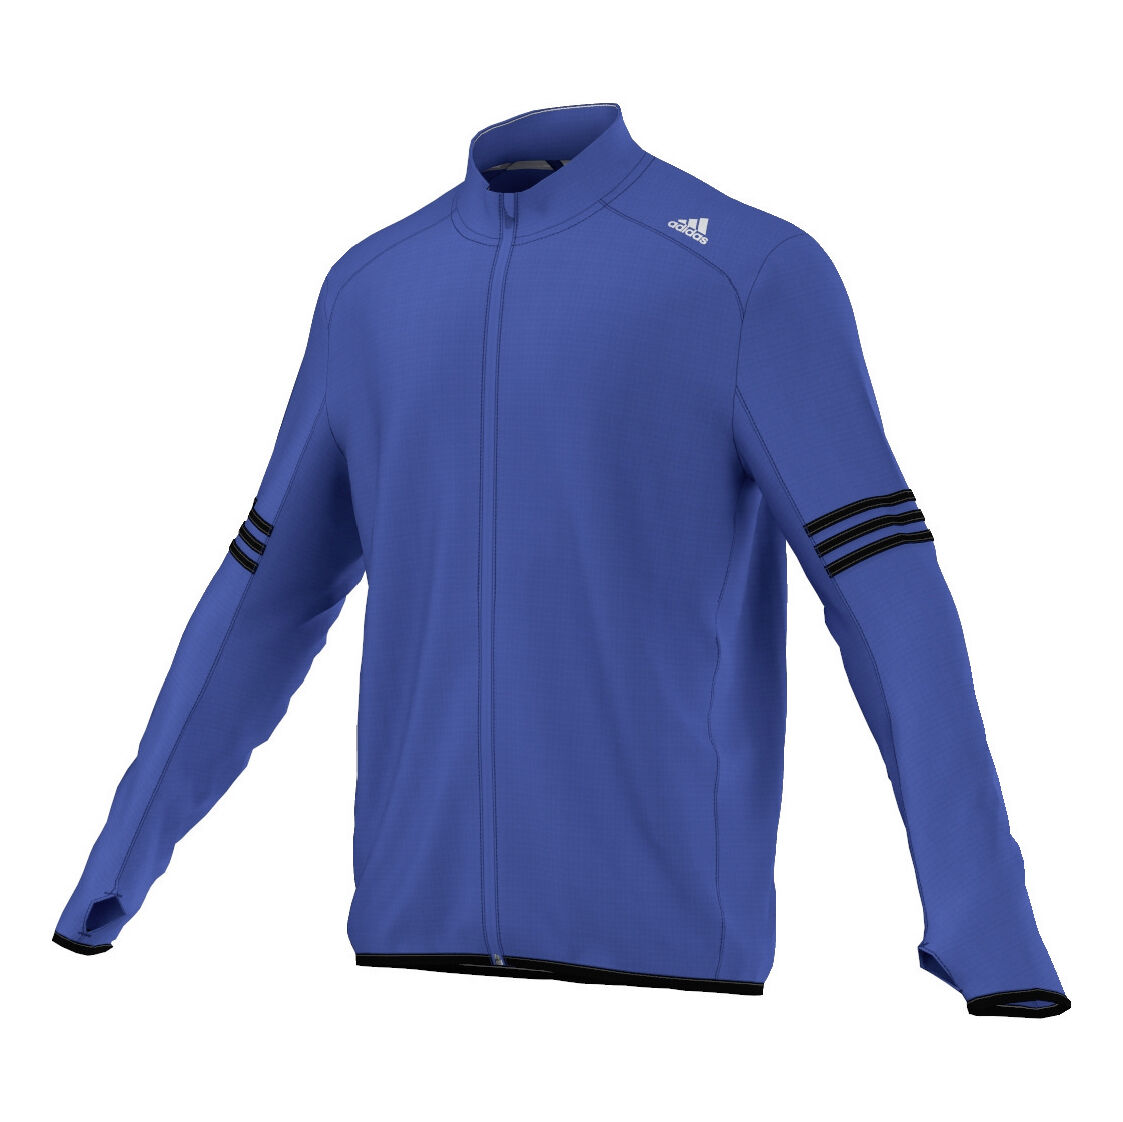 adidas Response Wind Jacket Trainingsjacke Herren Blau